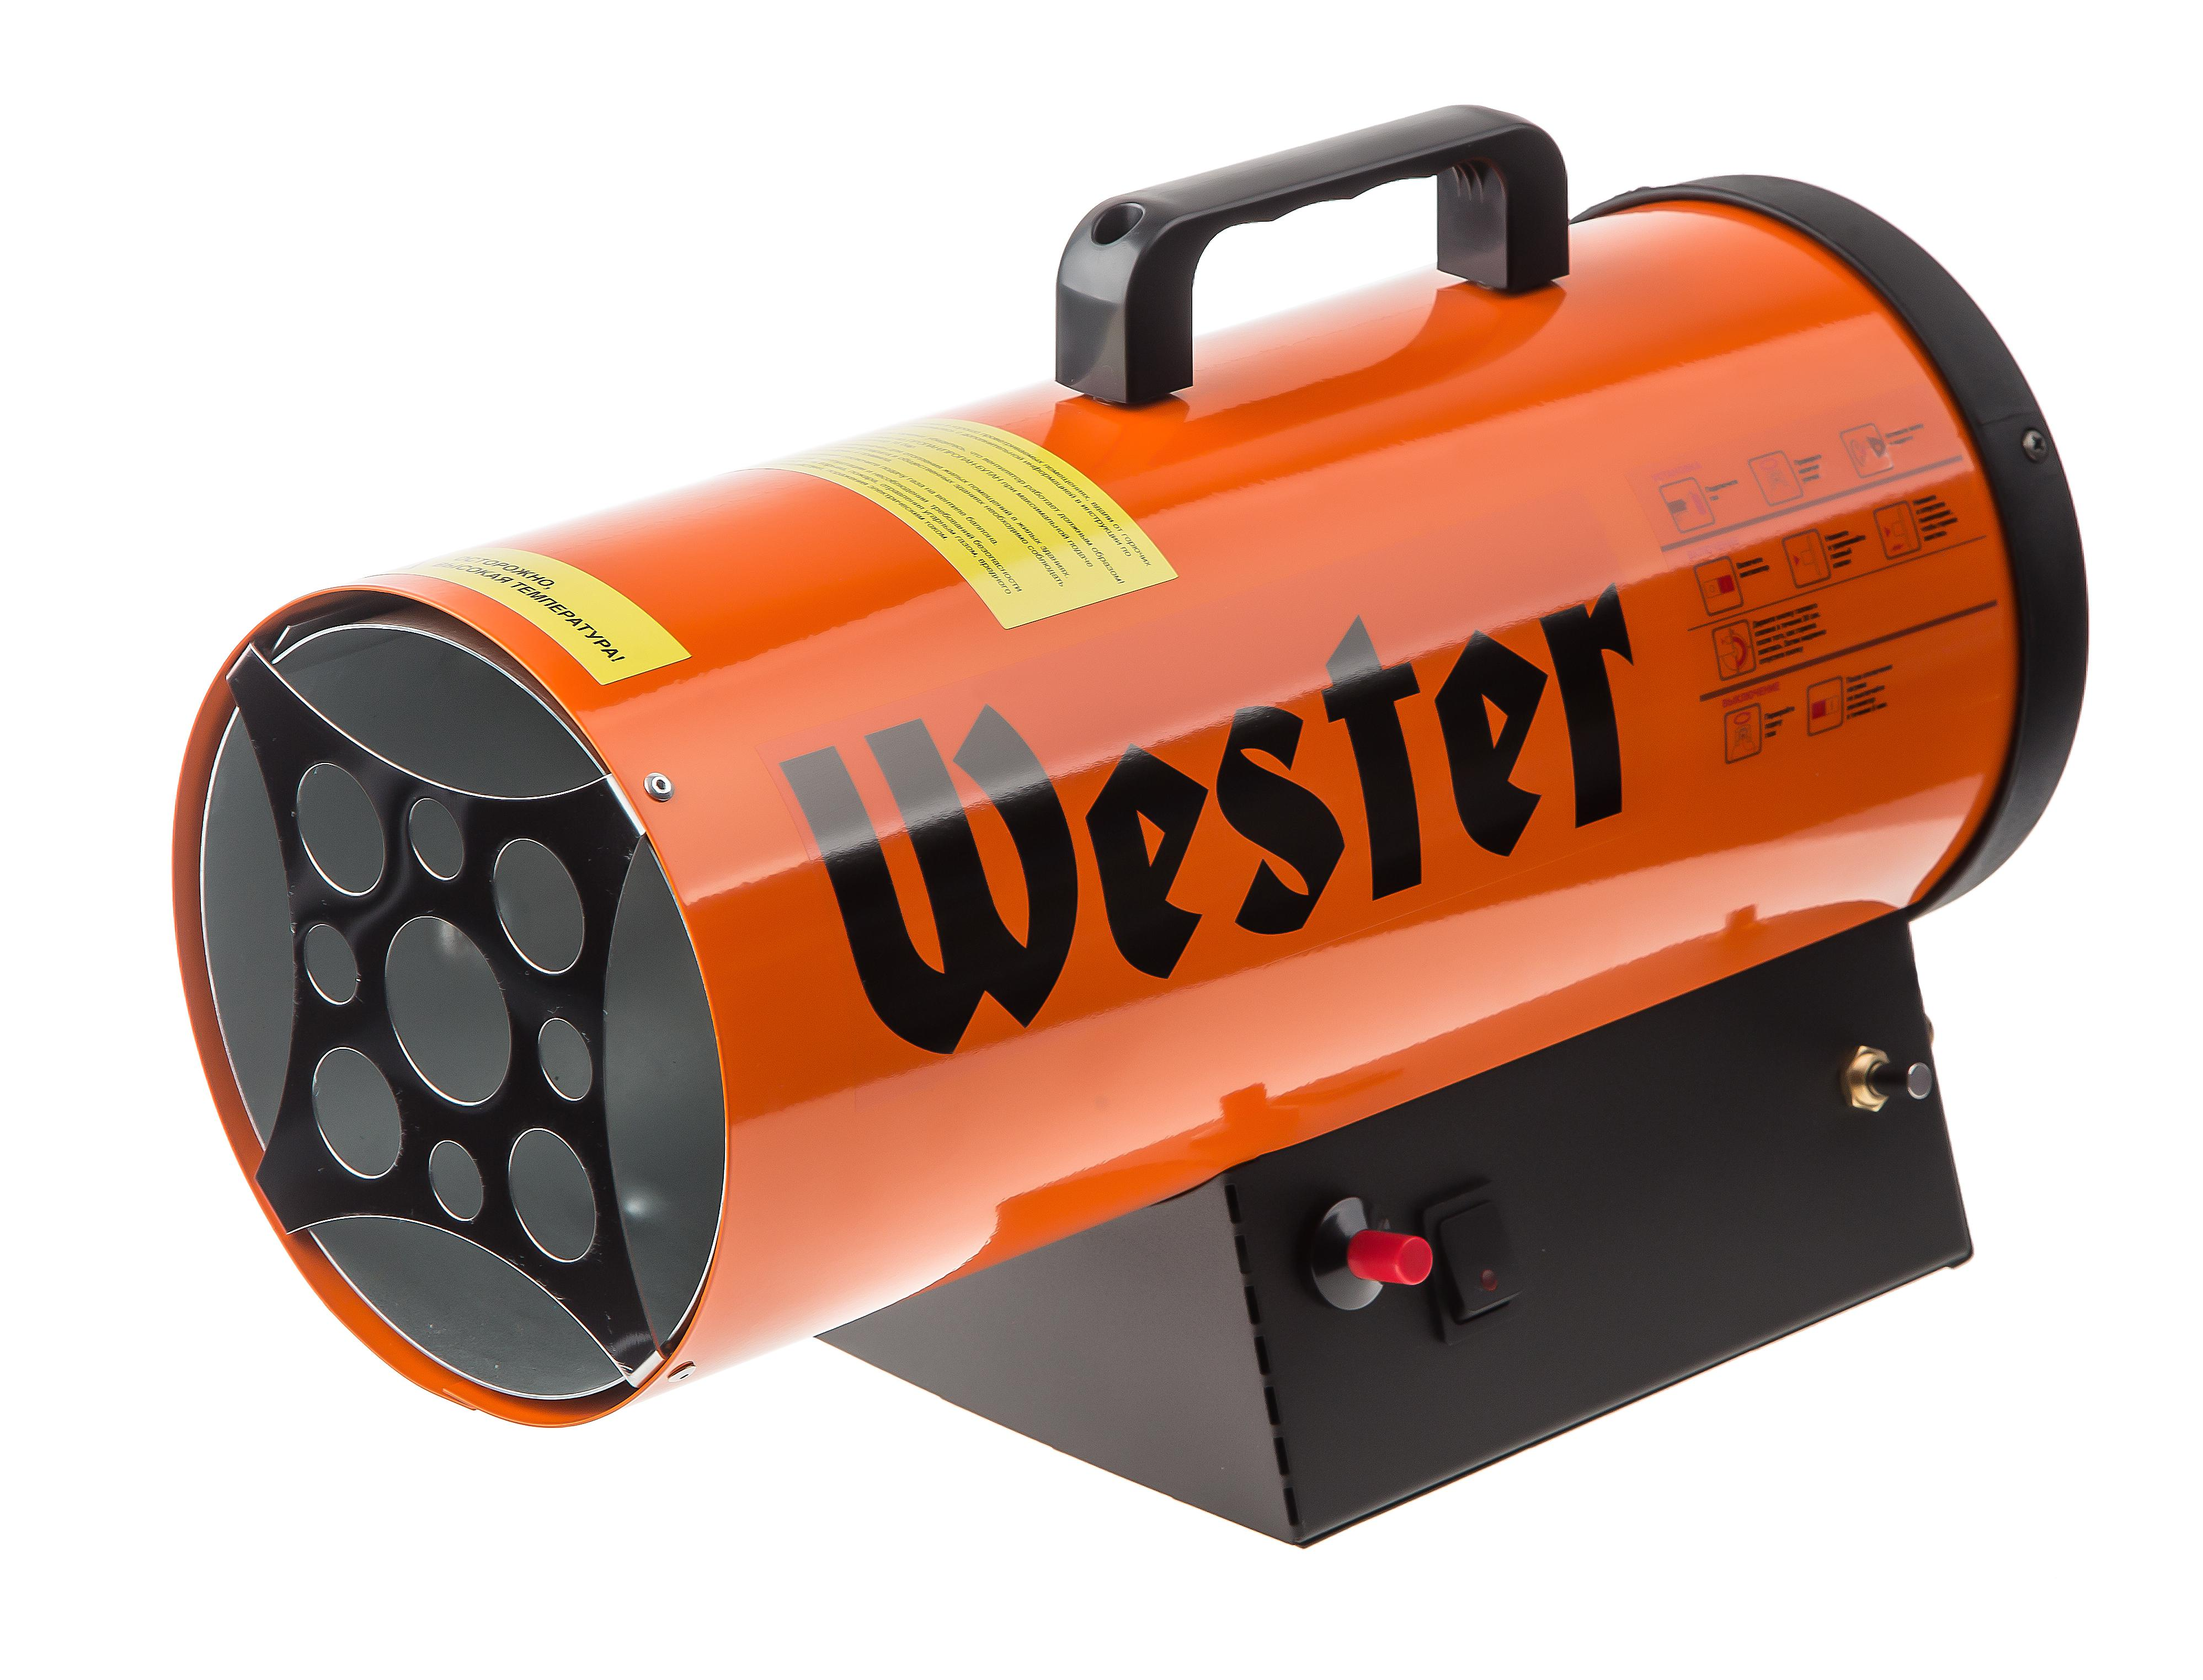 Тепловая пушка Wester Tg-12 газовая